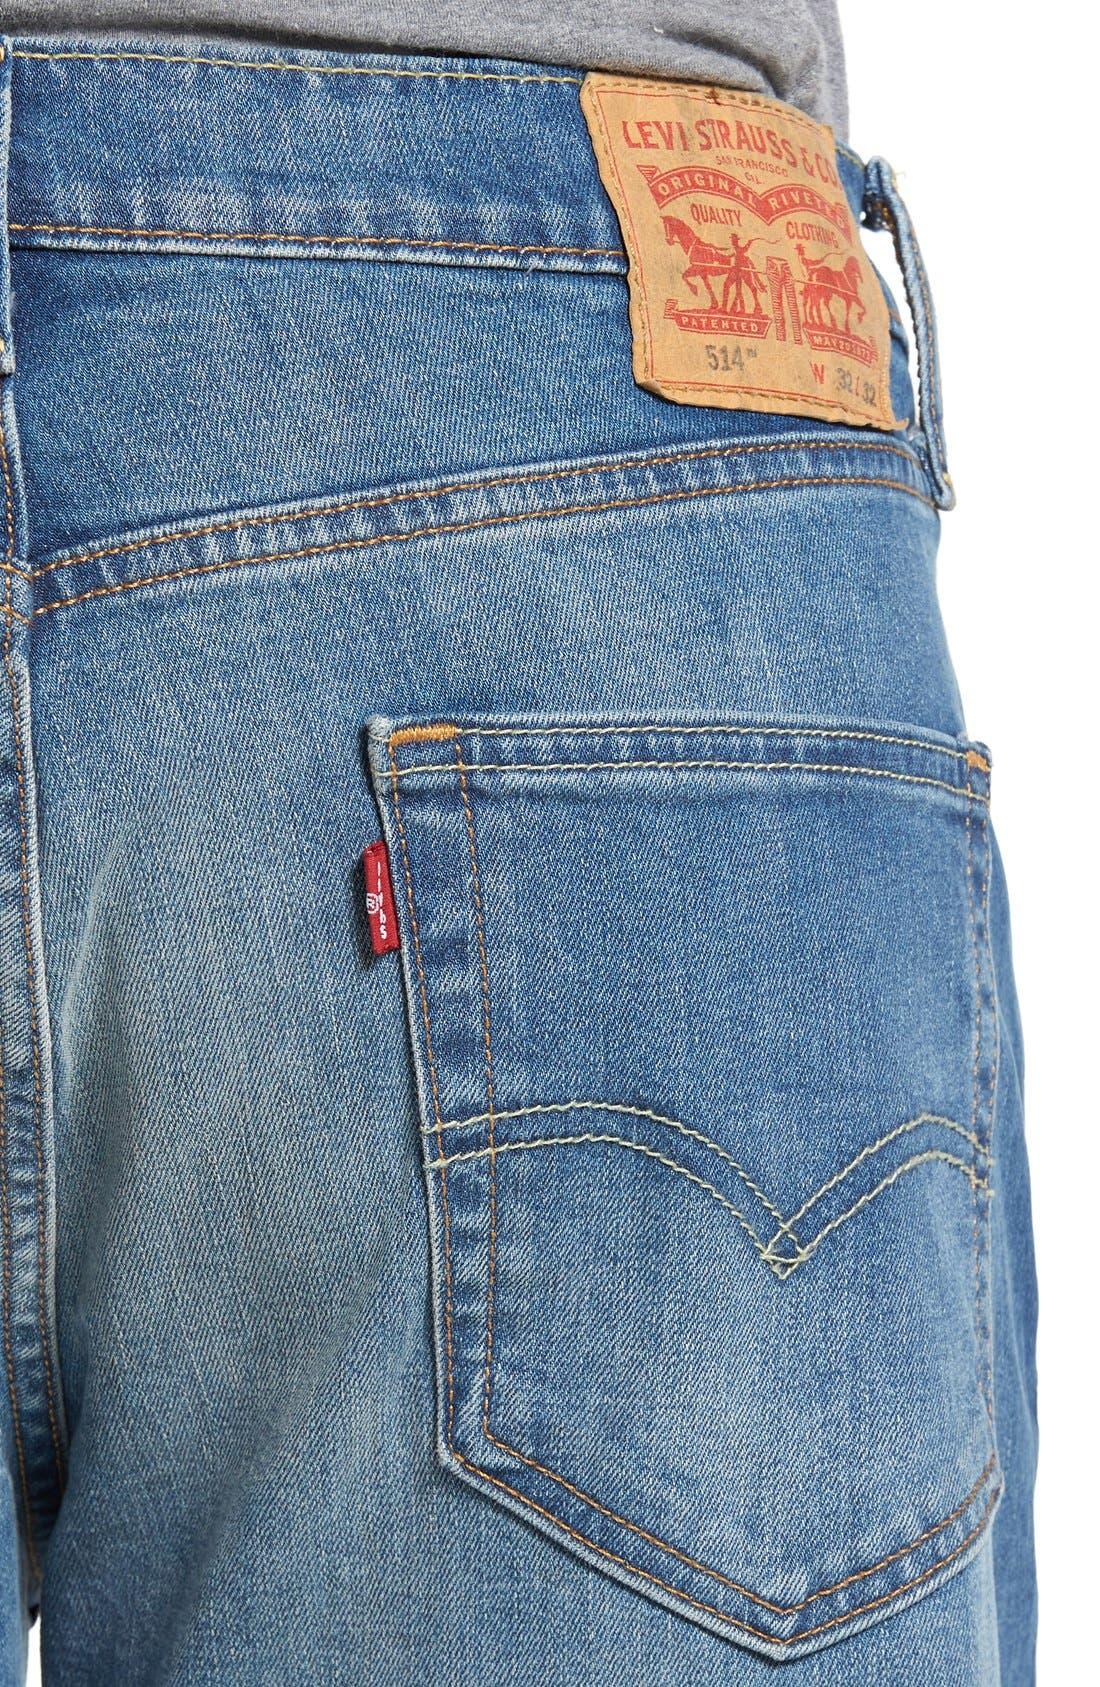 514<sup>™</sup> Straight Leg Jeans,                             Alternate thumbnail 3, color,                             HAGGARD